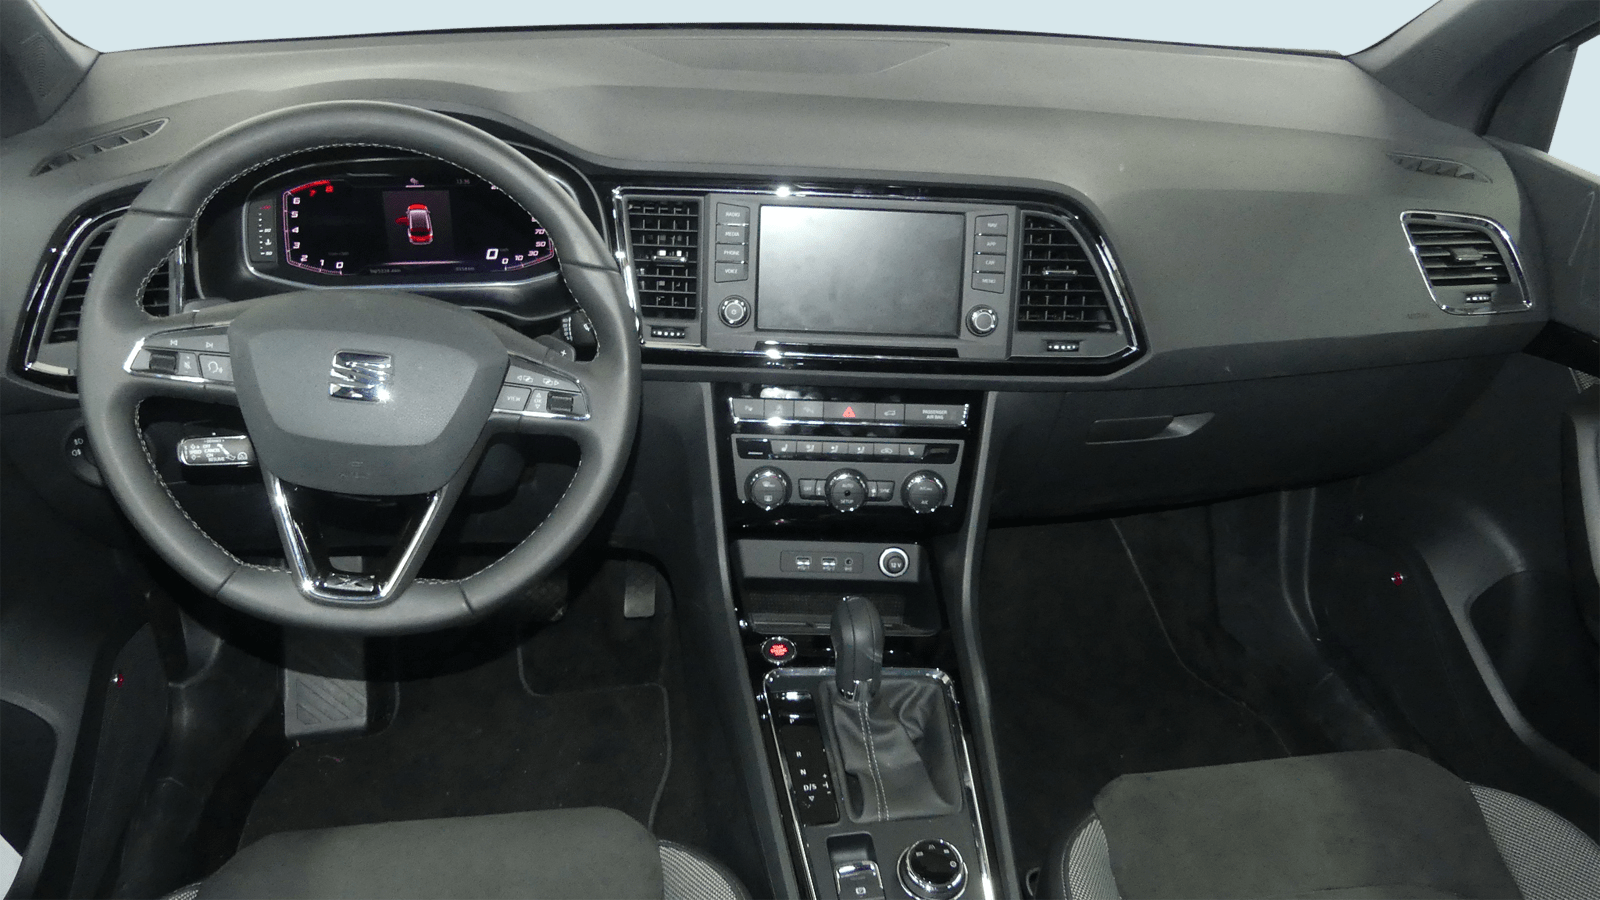 SEAT Ateca Black interior - Clyde car subscription